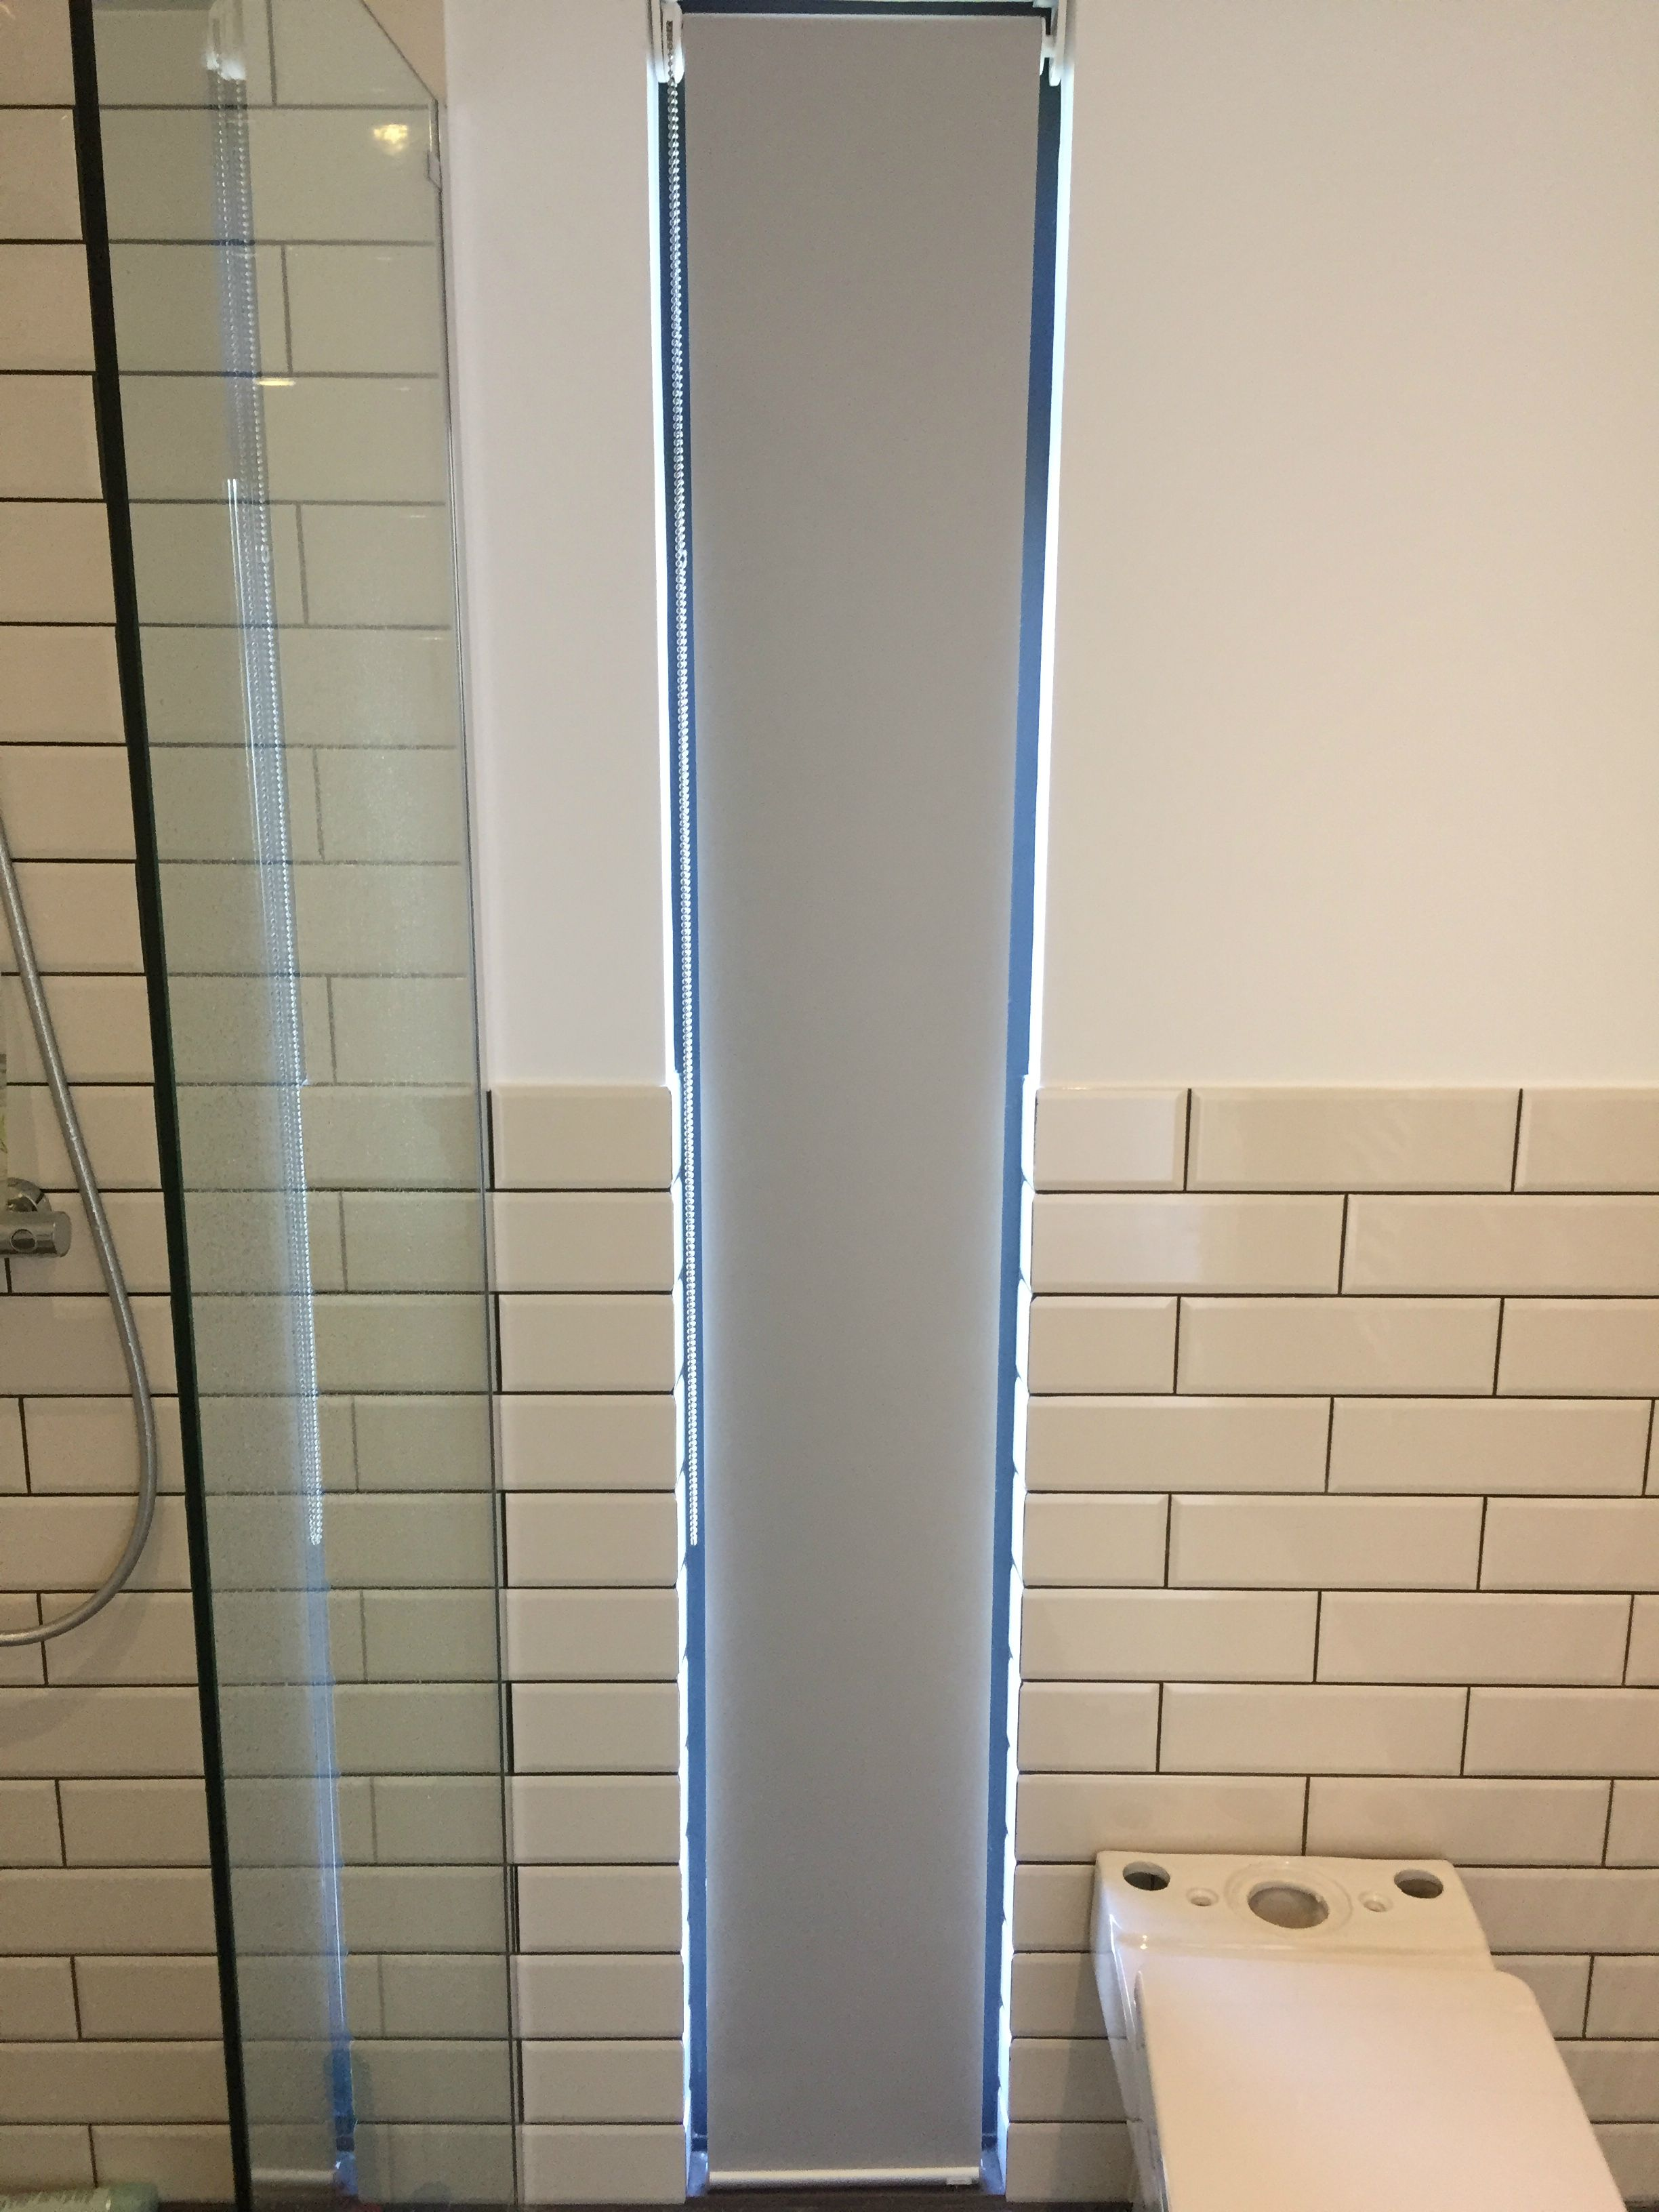 Waterproof Roller Blind Installed Reverse Roll For Ensuite - Waterproof roller blind for bathroom for bathroom decor ideas